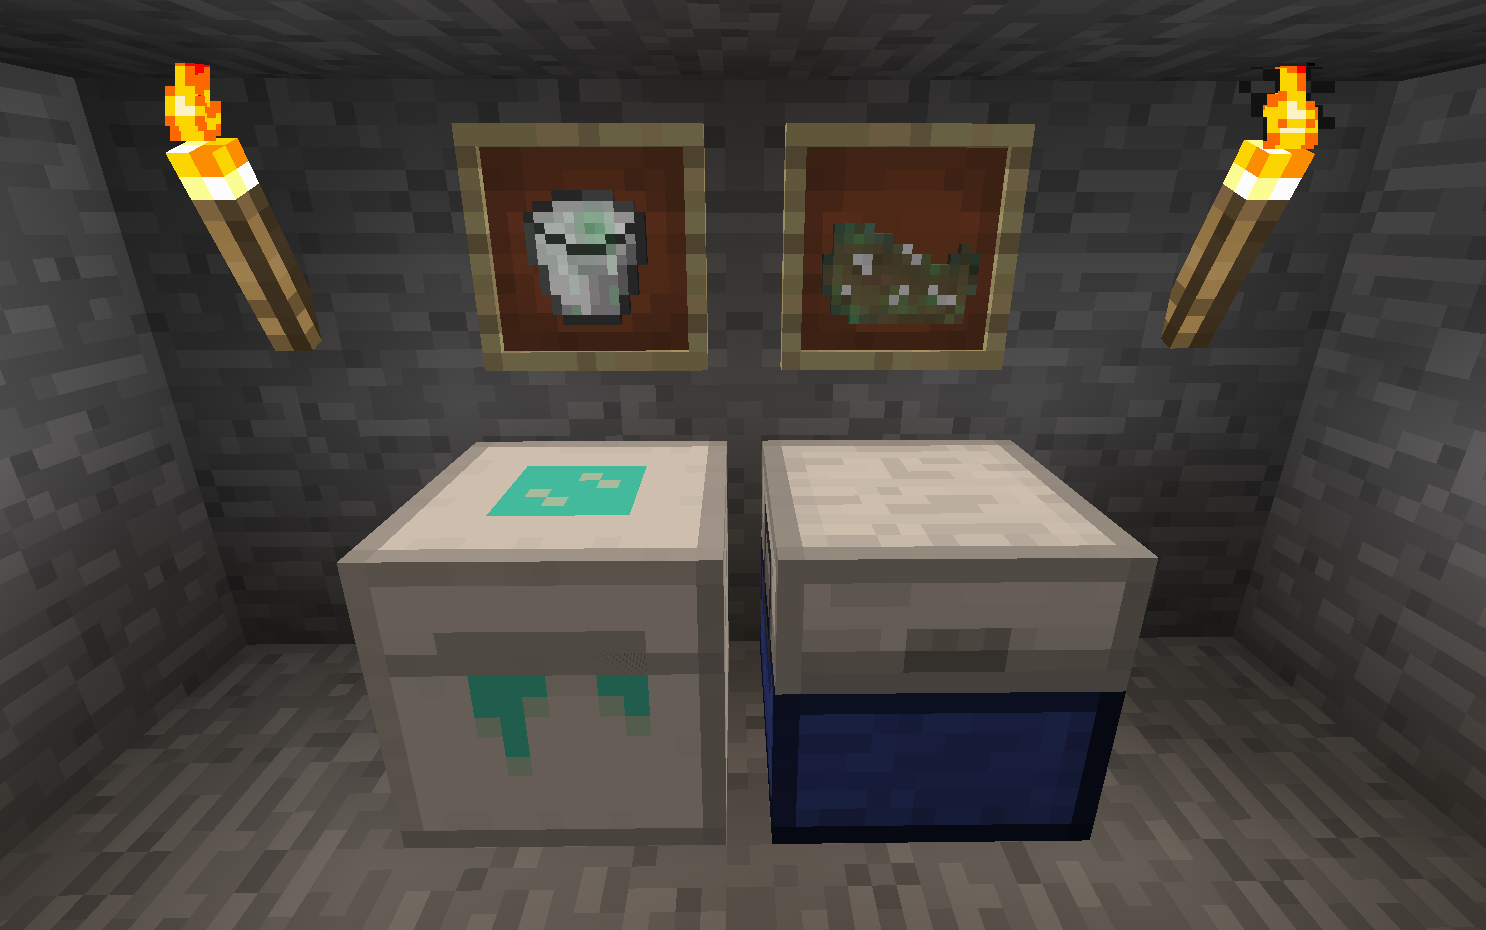 Freezer and Esky